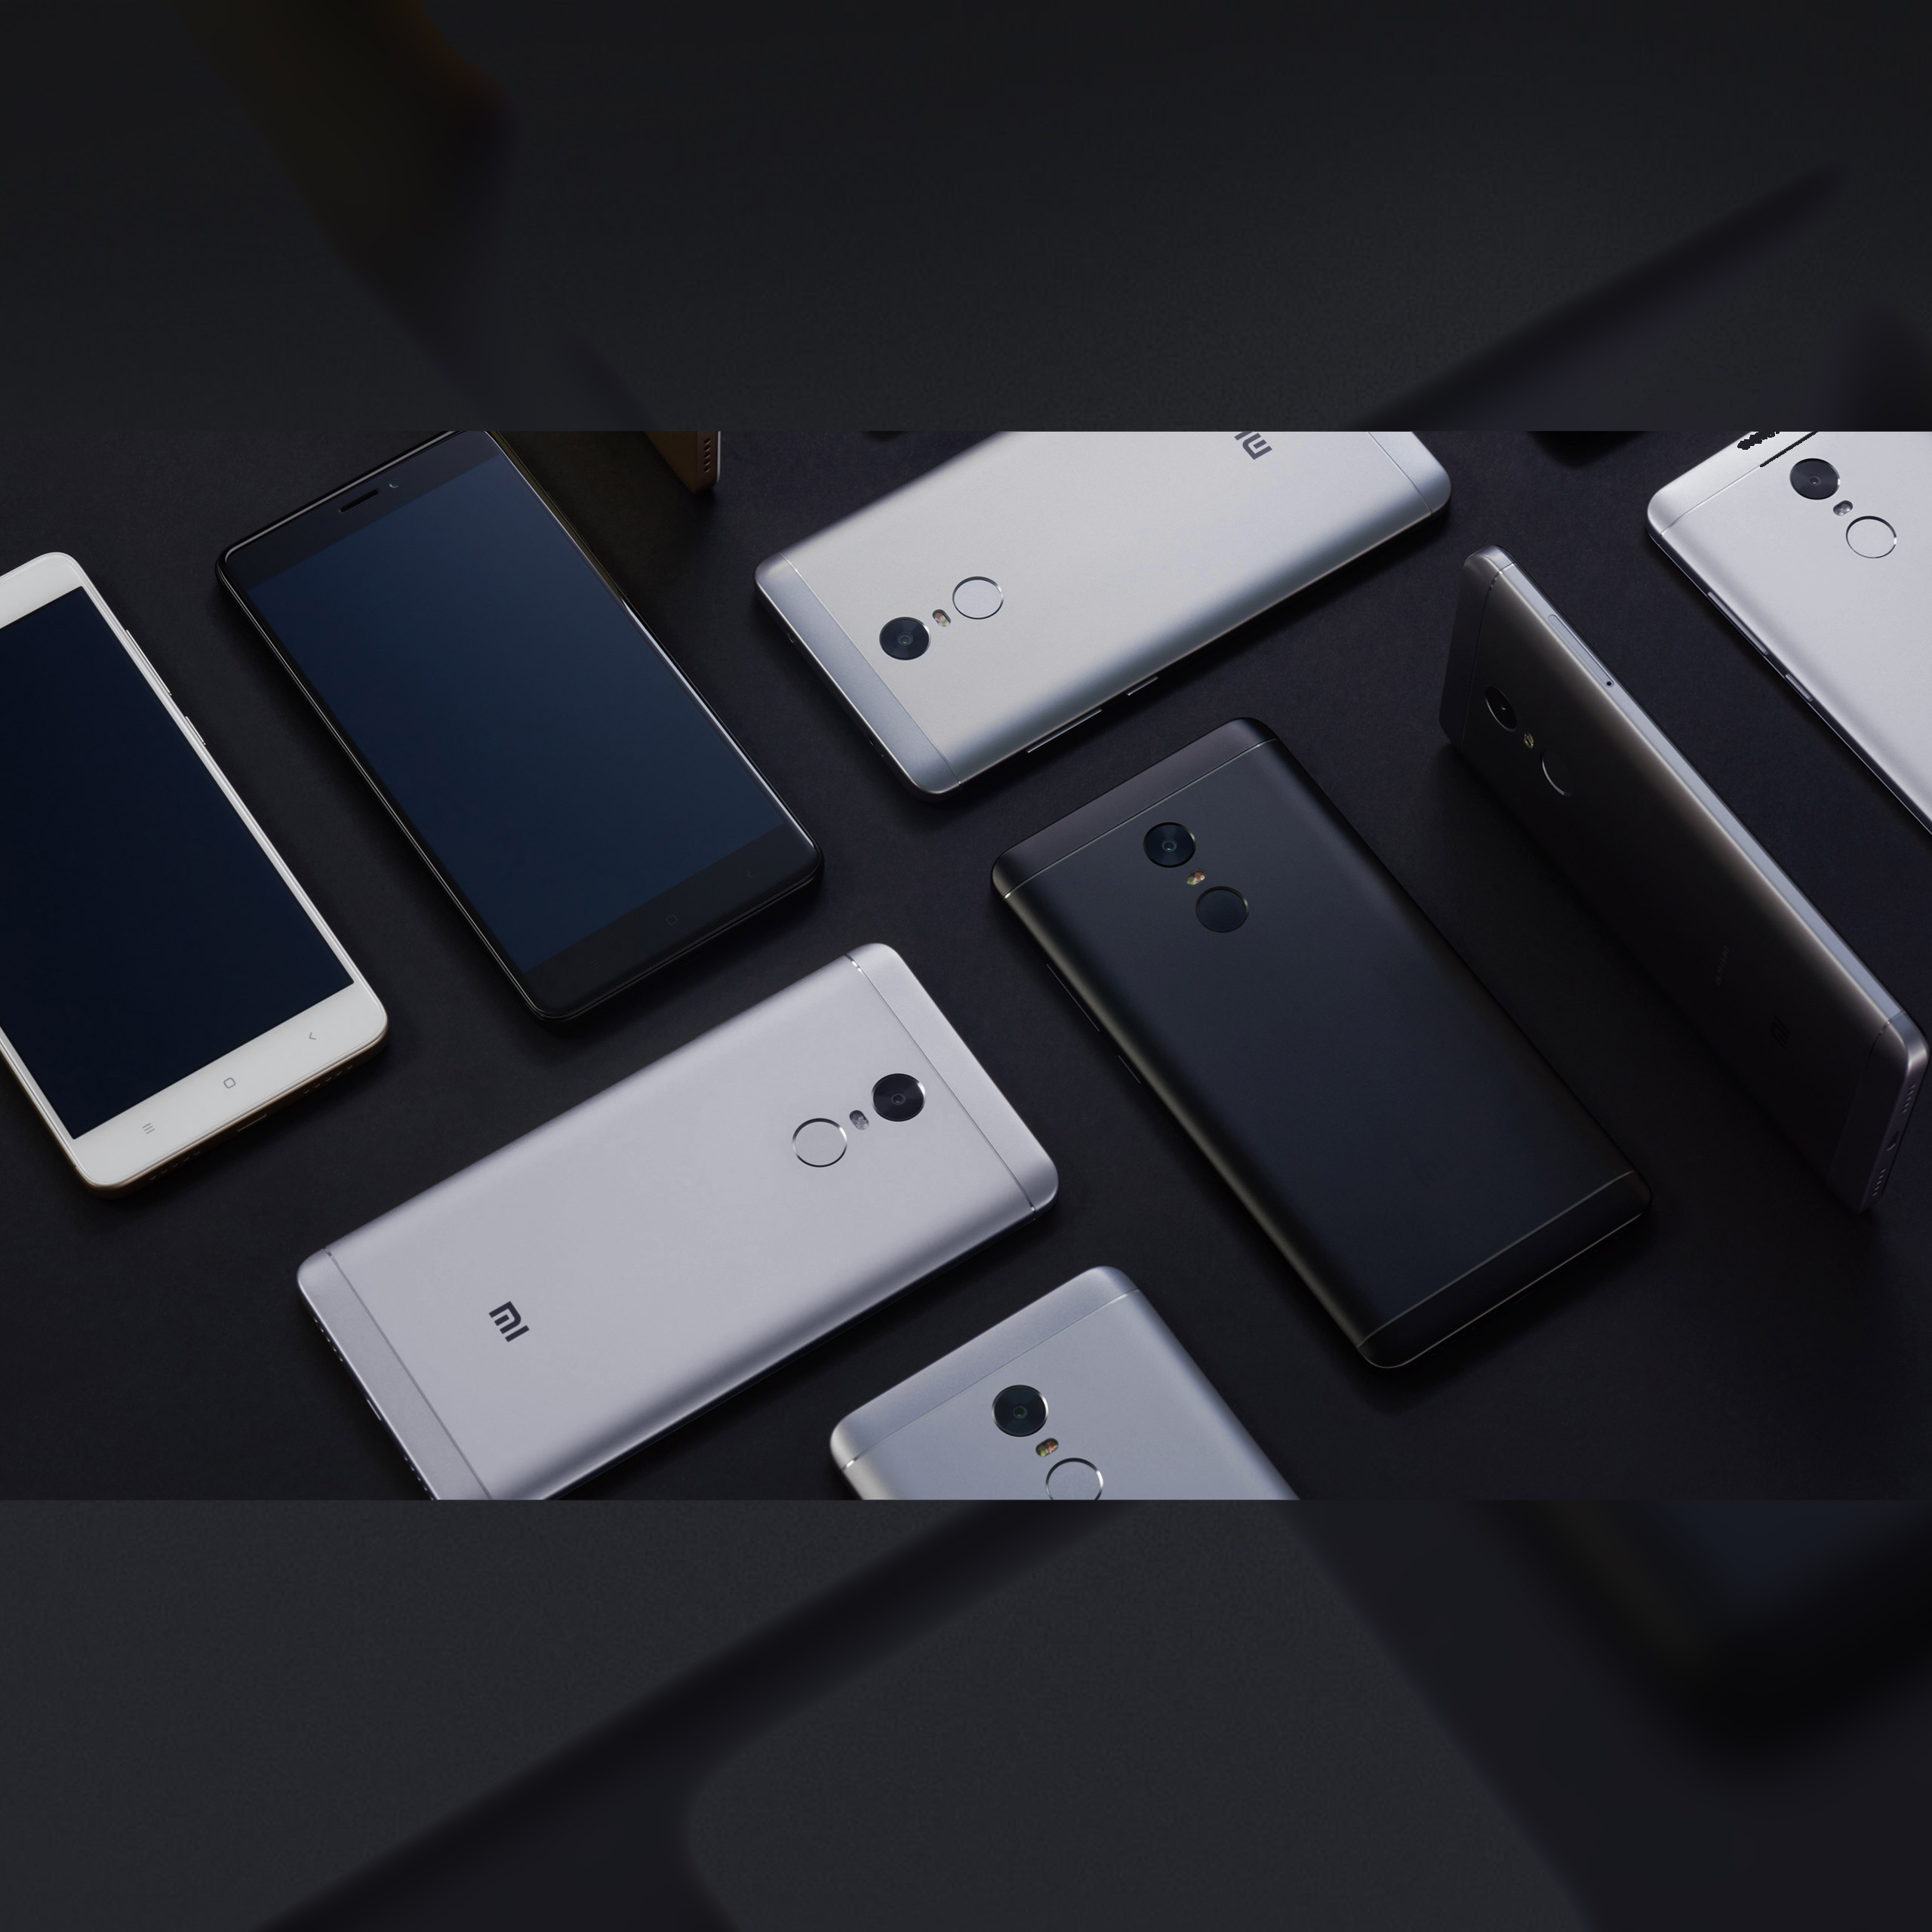 Xiaomi Redmi Note 4 3 32 Smartphone Eu Wayteq Europe Pro Grey Okostelefon